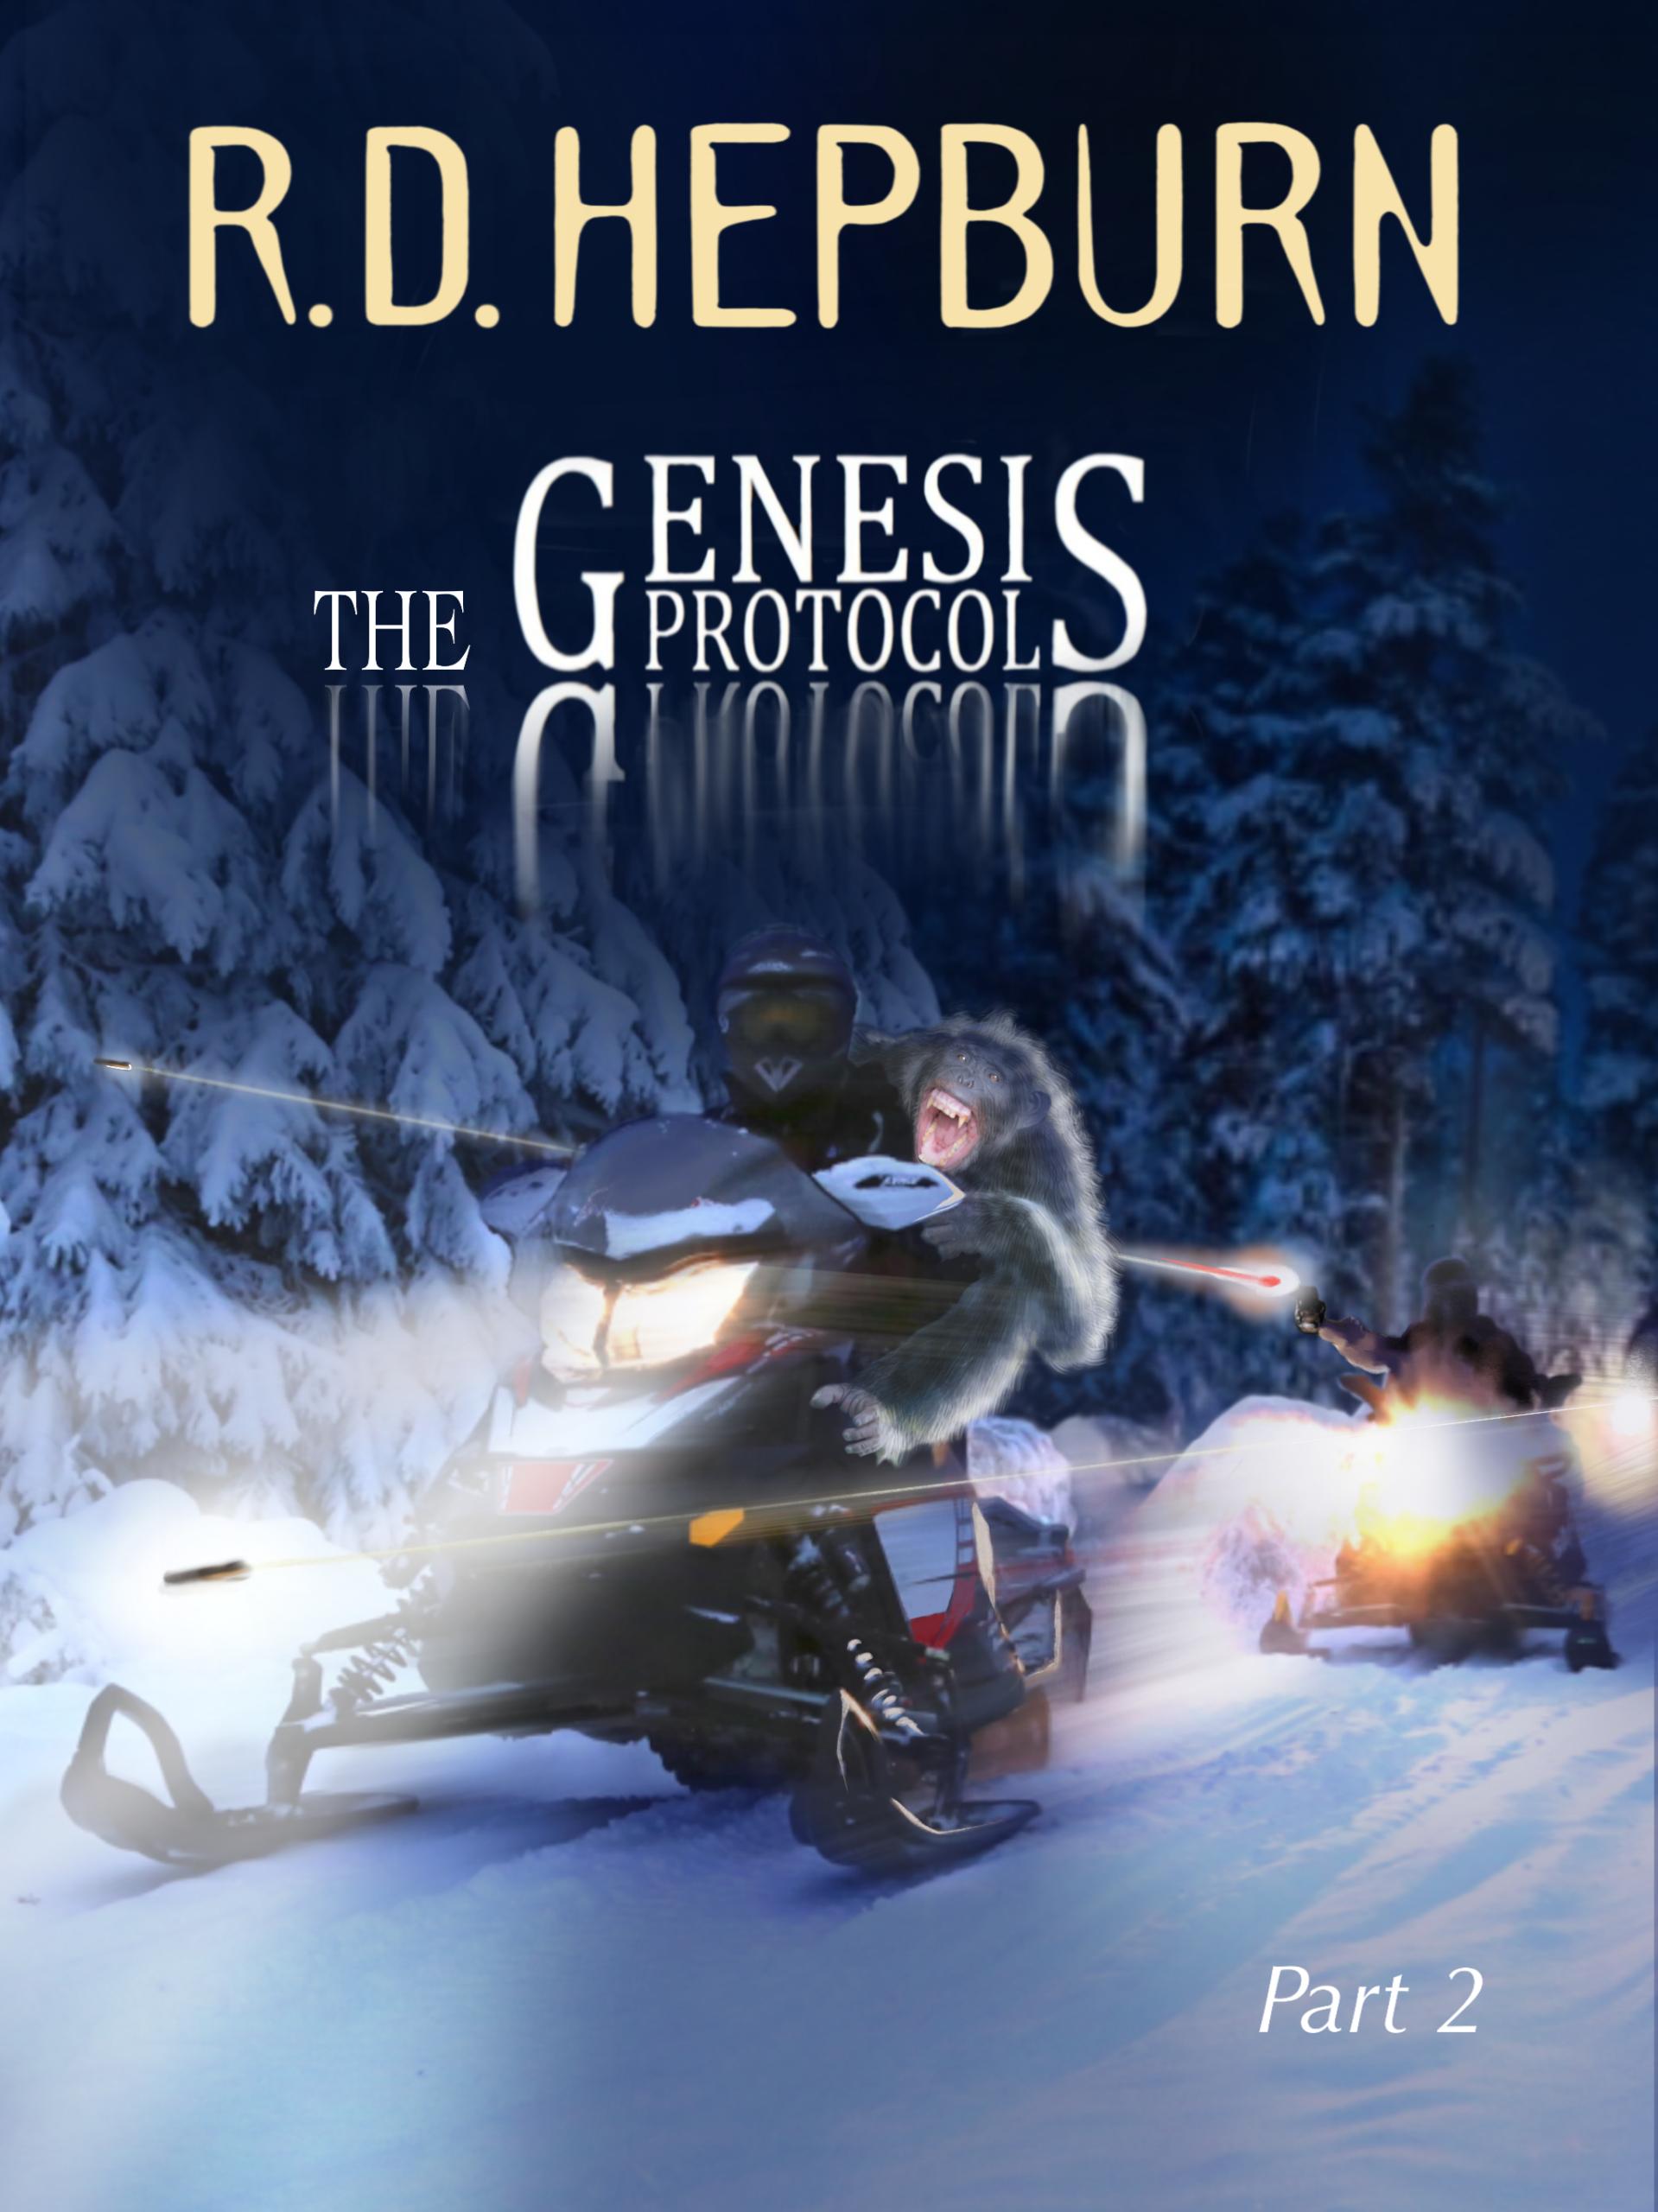 The Genesis Protocol Part 2